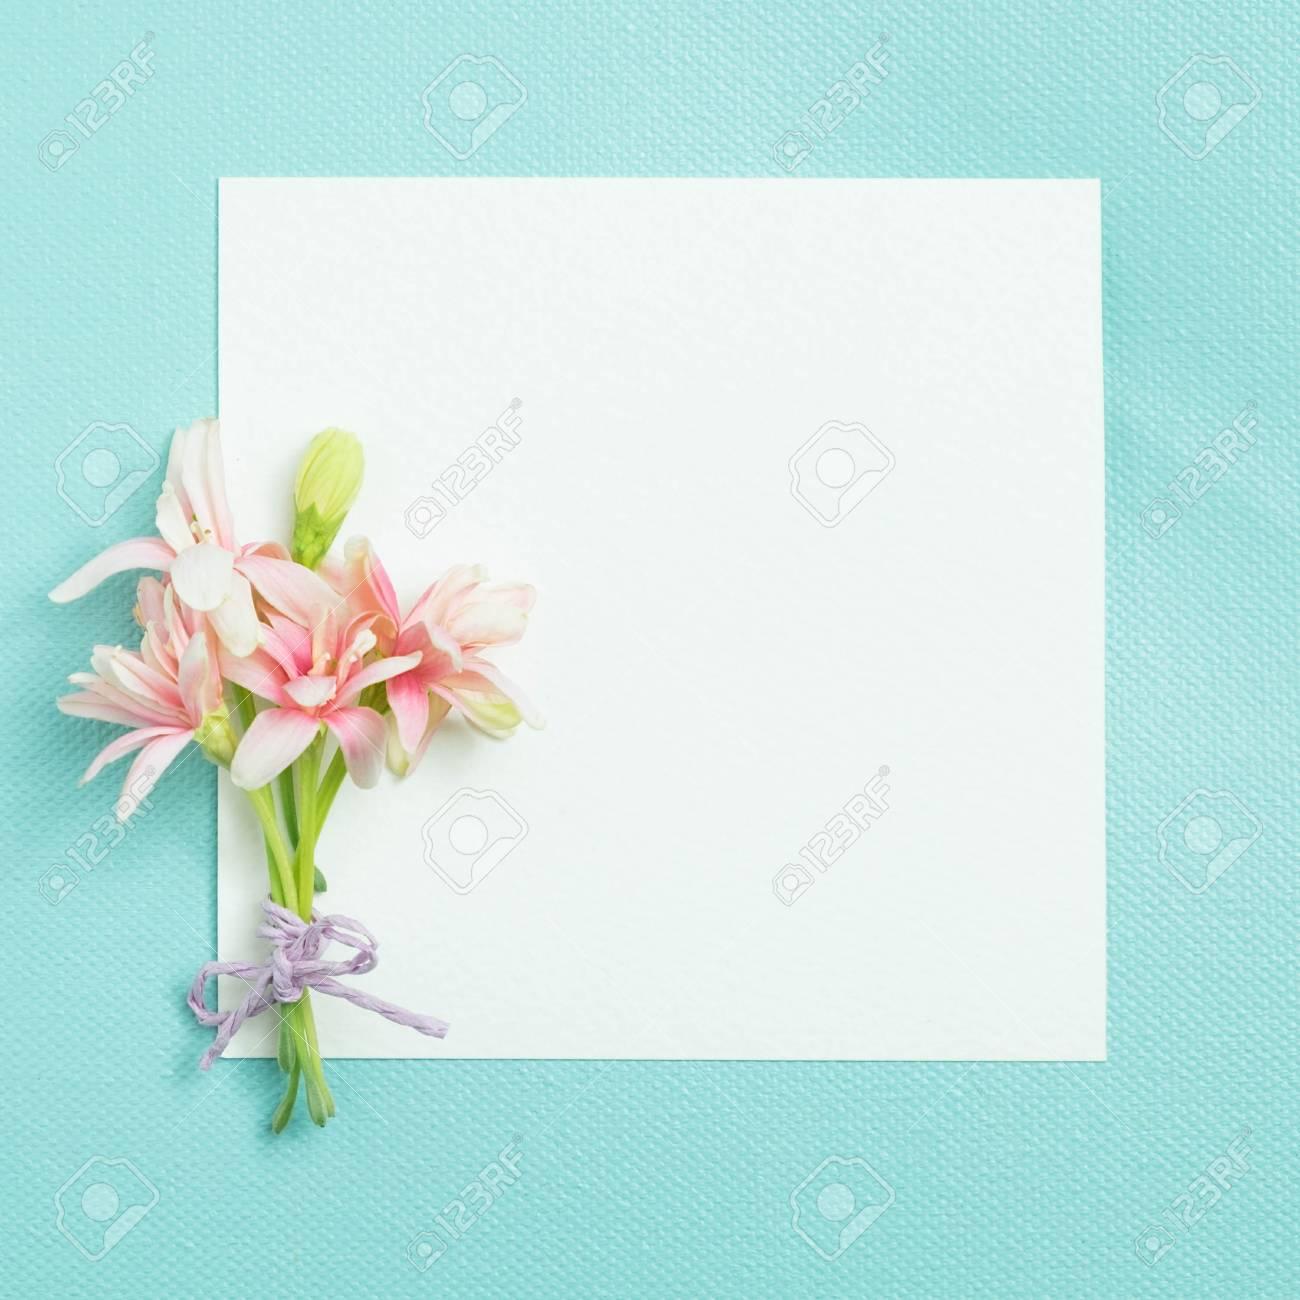 bunch of little lovely flower on white empty paper card over